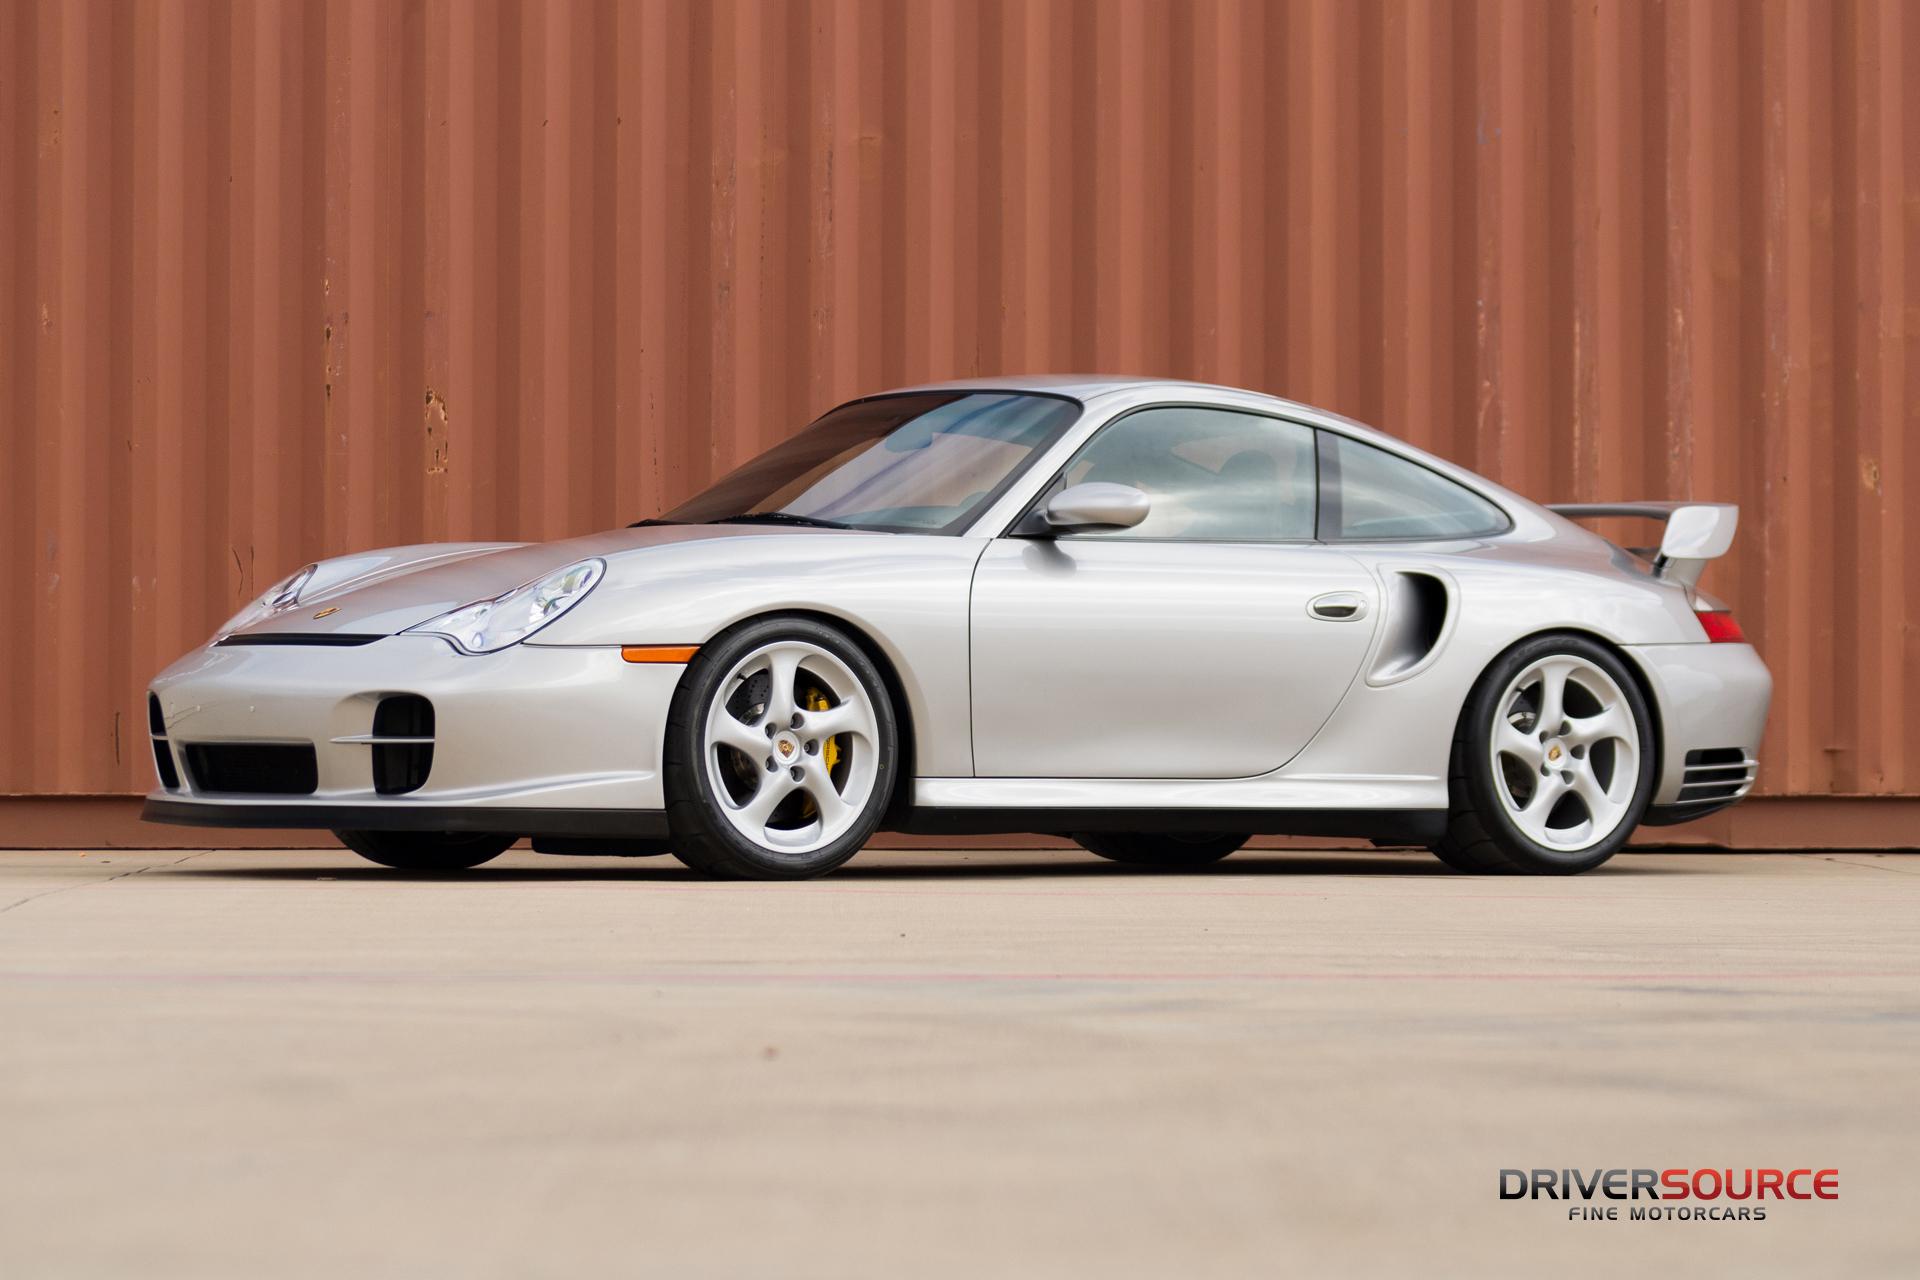 2002 porsche 911 gt2 driversource fine motorcars. Black Bedroom Furniture Sets. Home Design Ideas